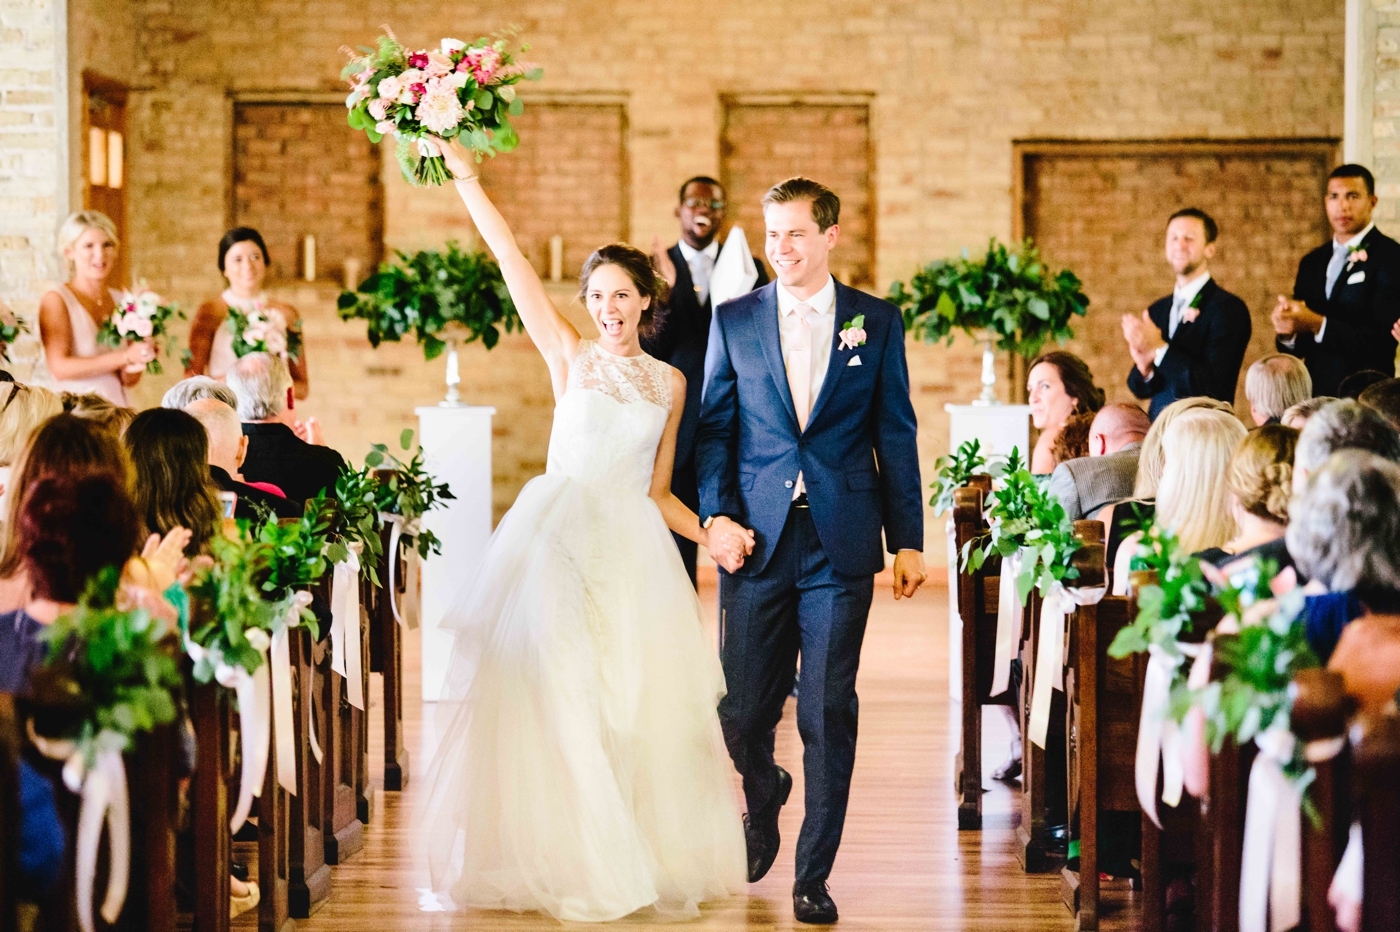 chicago-fine-art-wedding-photography-tyma30